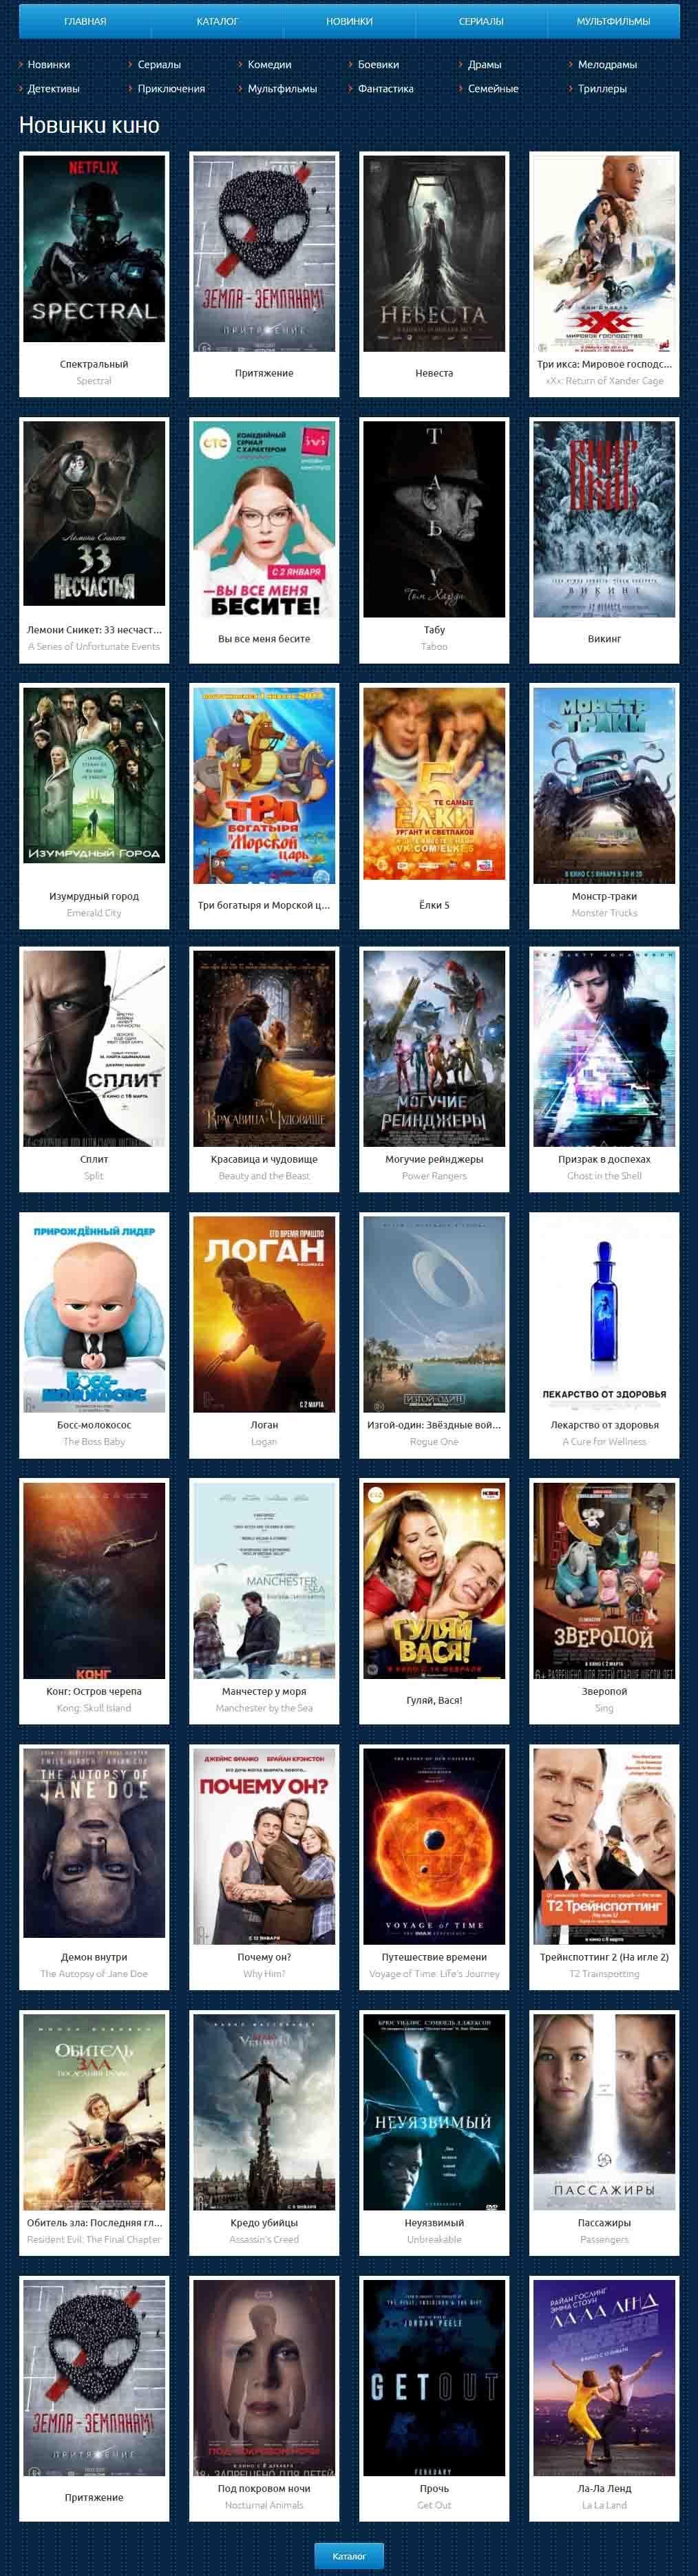 викинг 2017 смотреть в hd 720 качестве TH Kino